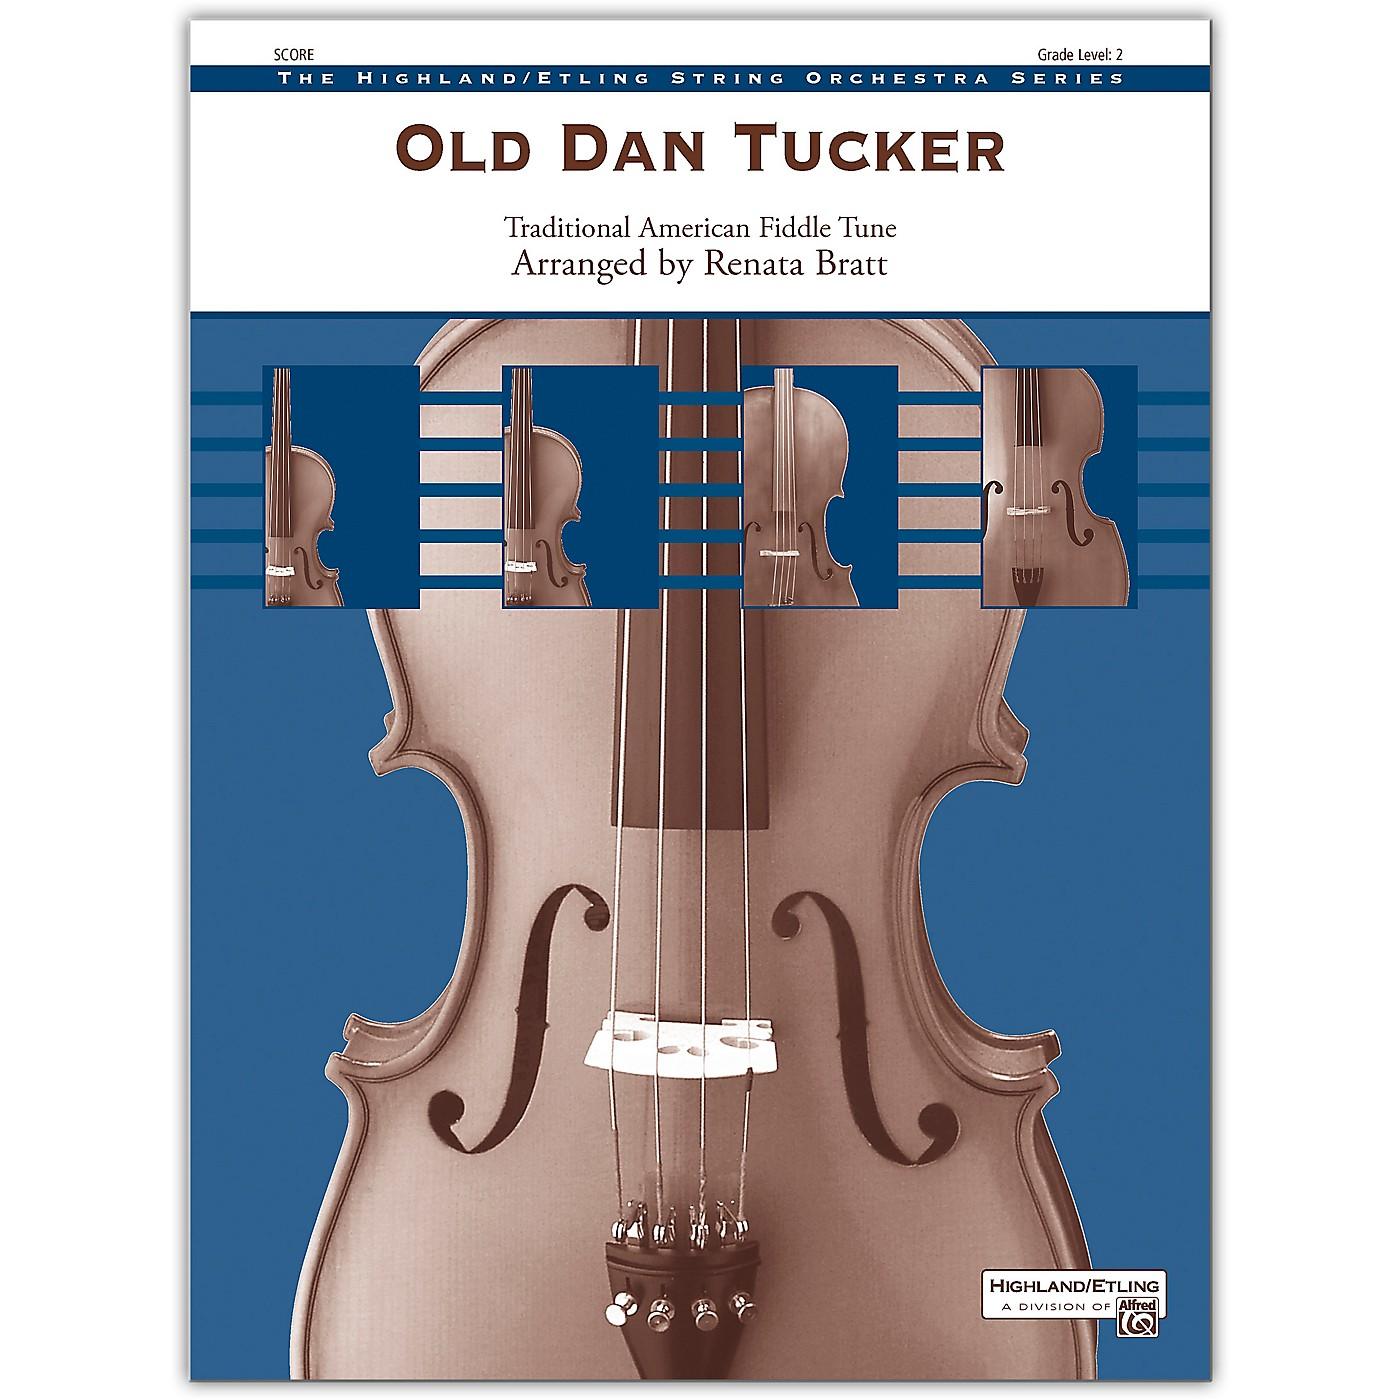 Alfred Old Dan Tucker Conductor Score 2 thumbnail